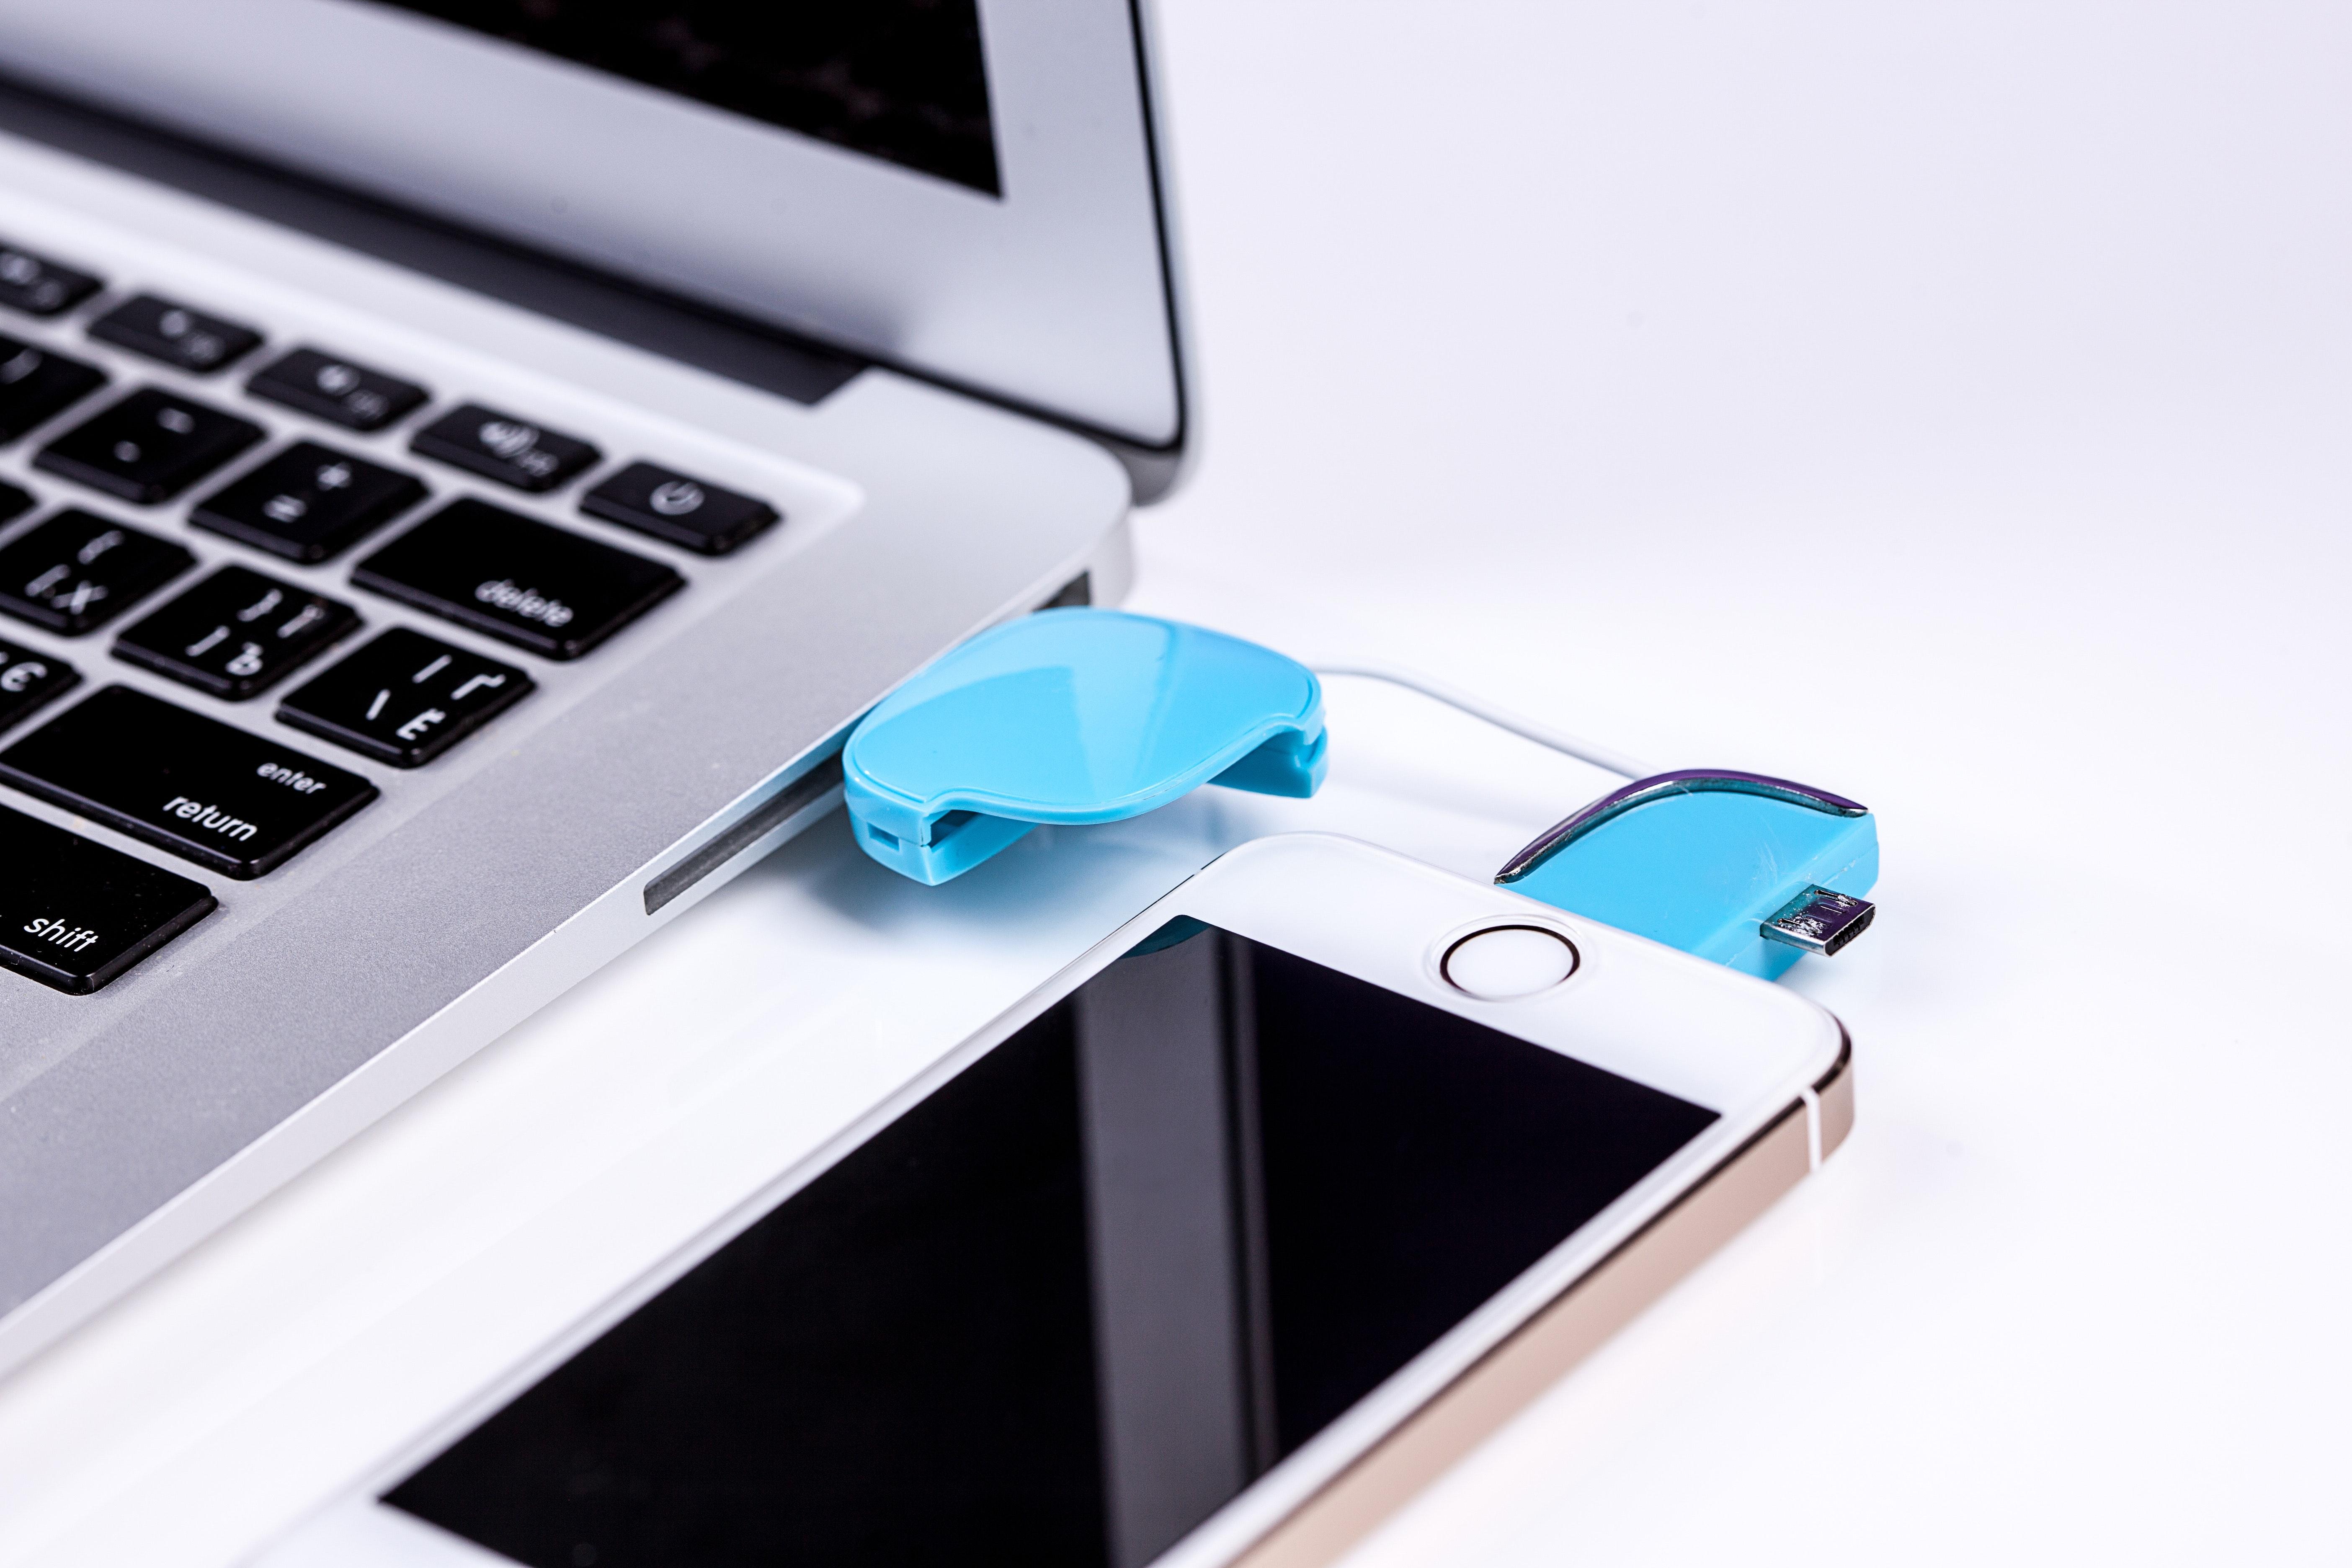 Silver iphone 5s near macbook photo